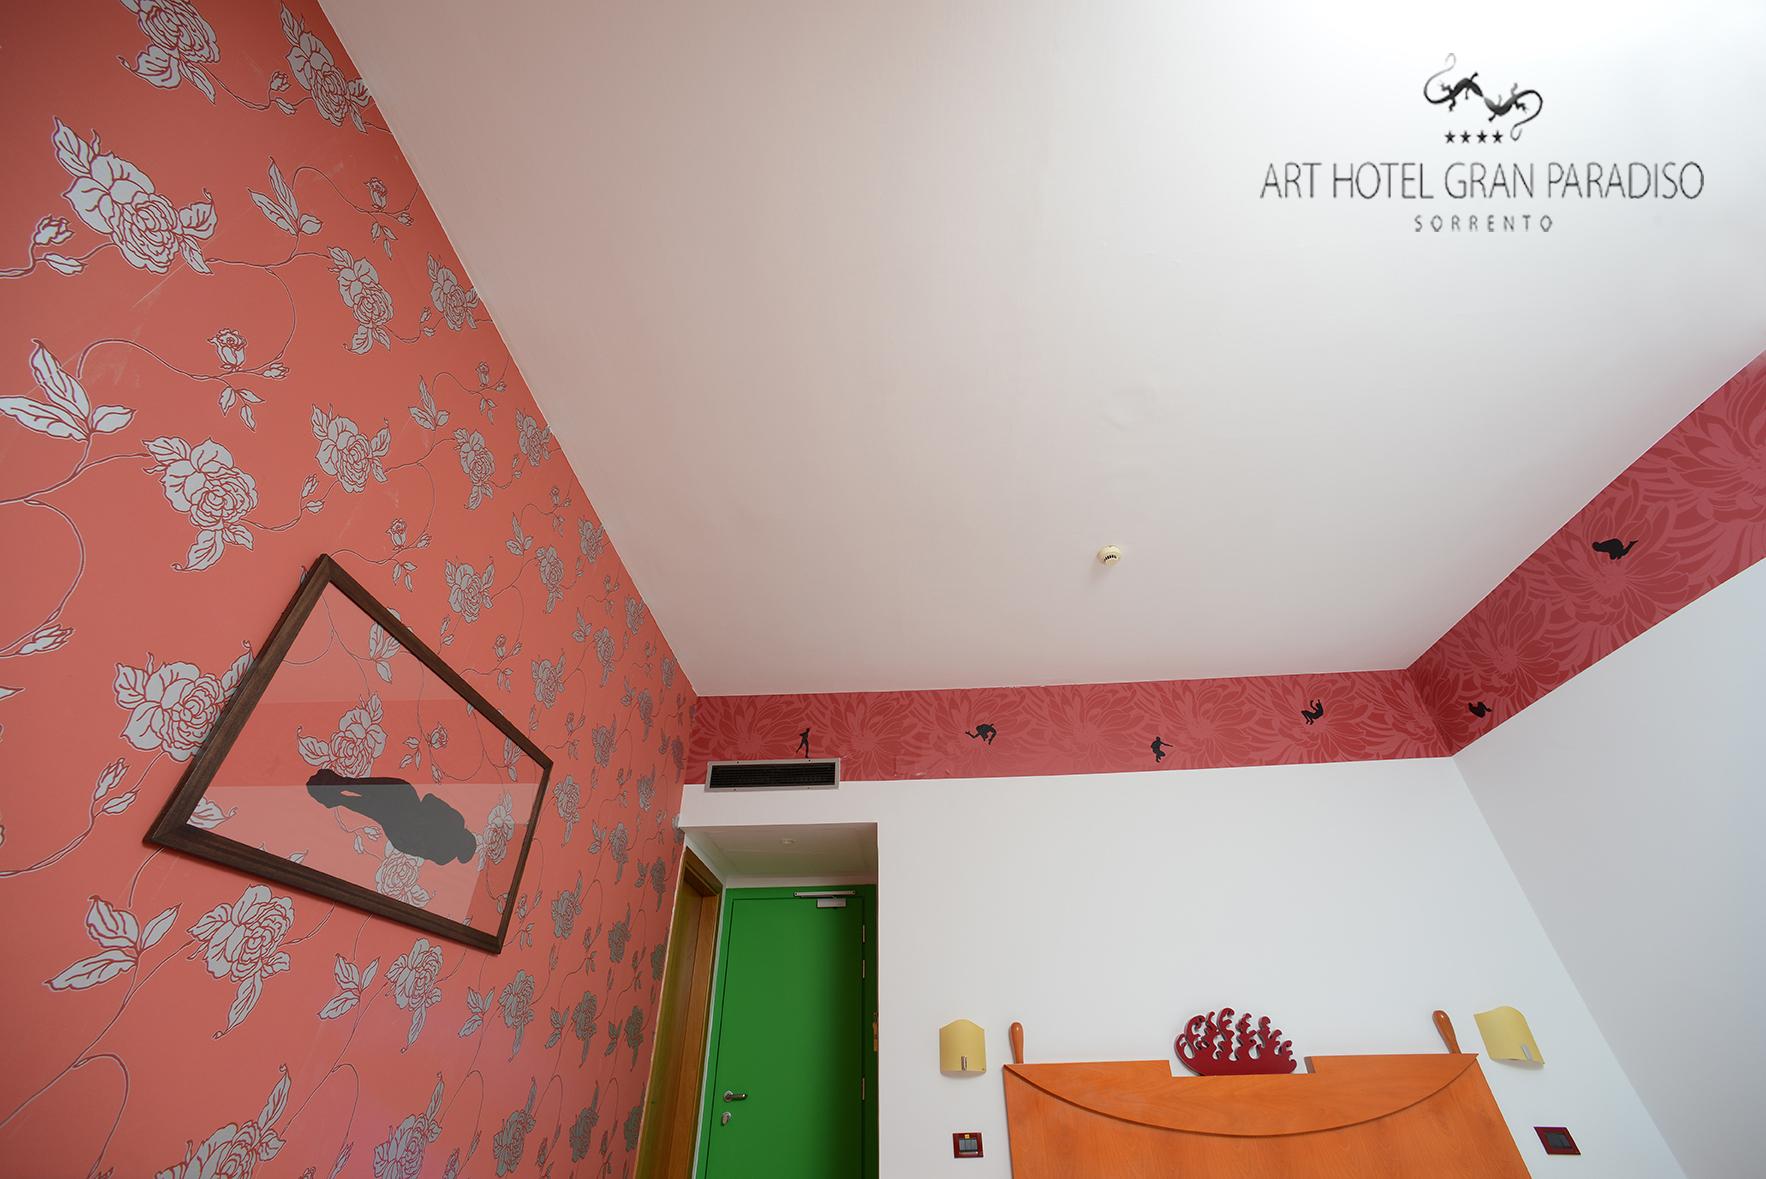 Art_Hotel_Gran_Paradiso_2013_311_Donatella_Spaziani_5.jpg